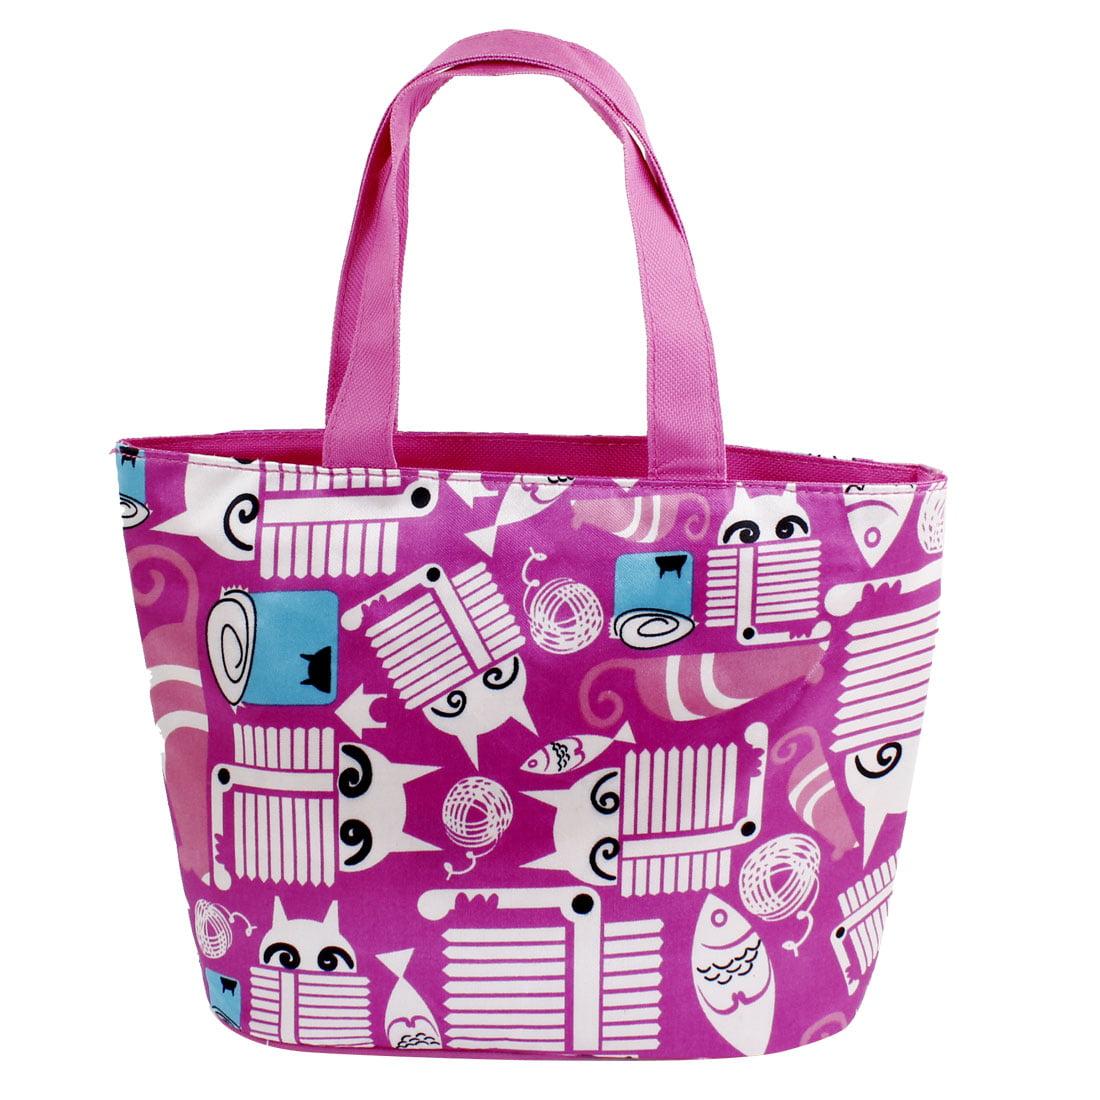 Woman Portable Foldway Fuchsia White Zipper Closure Shopping Bag Handbag